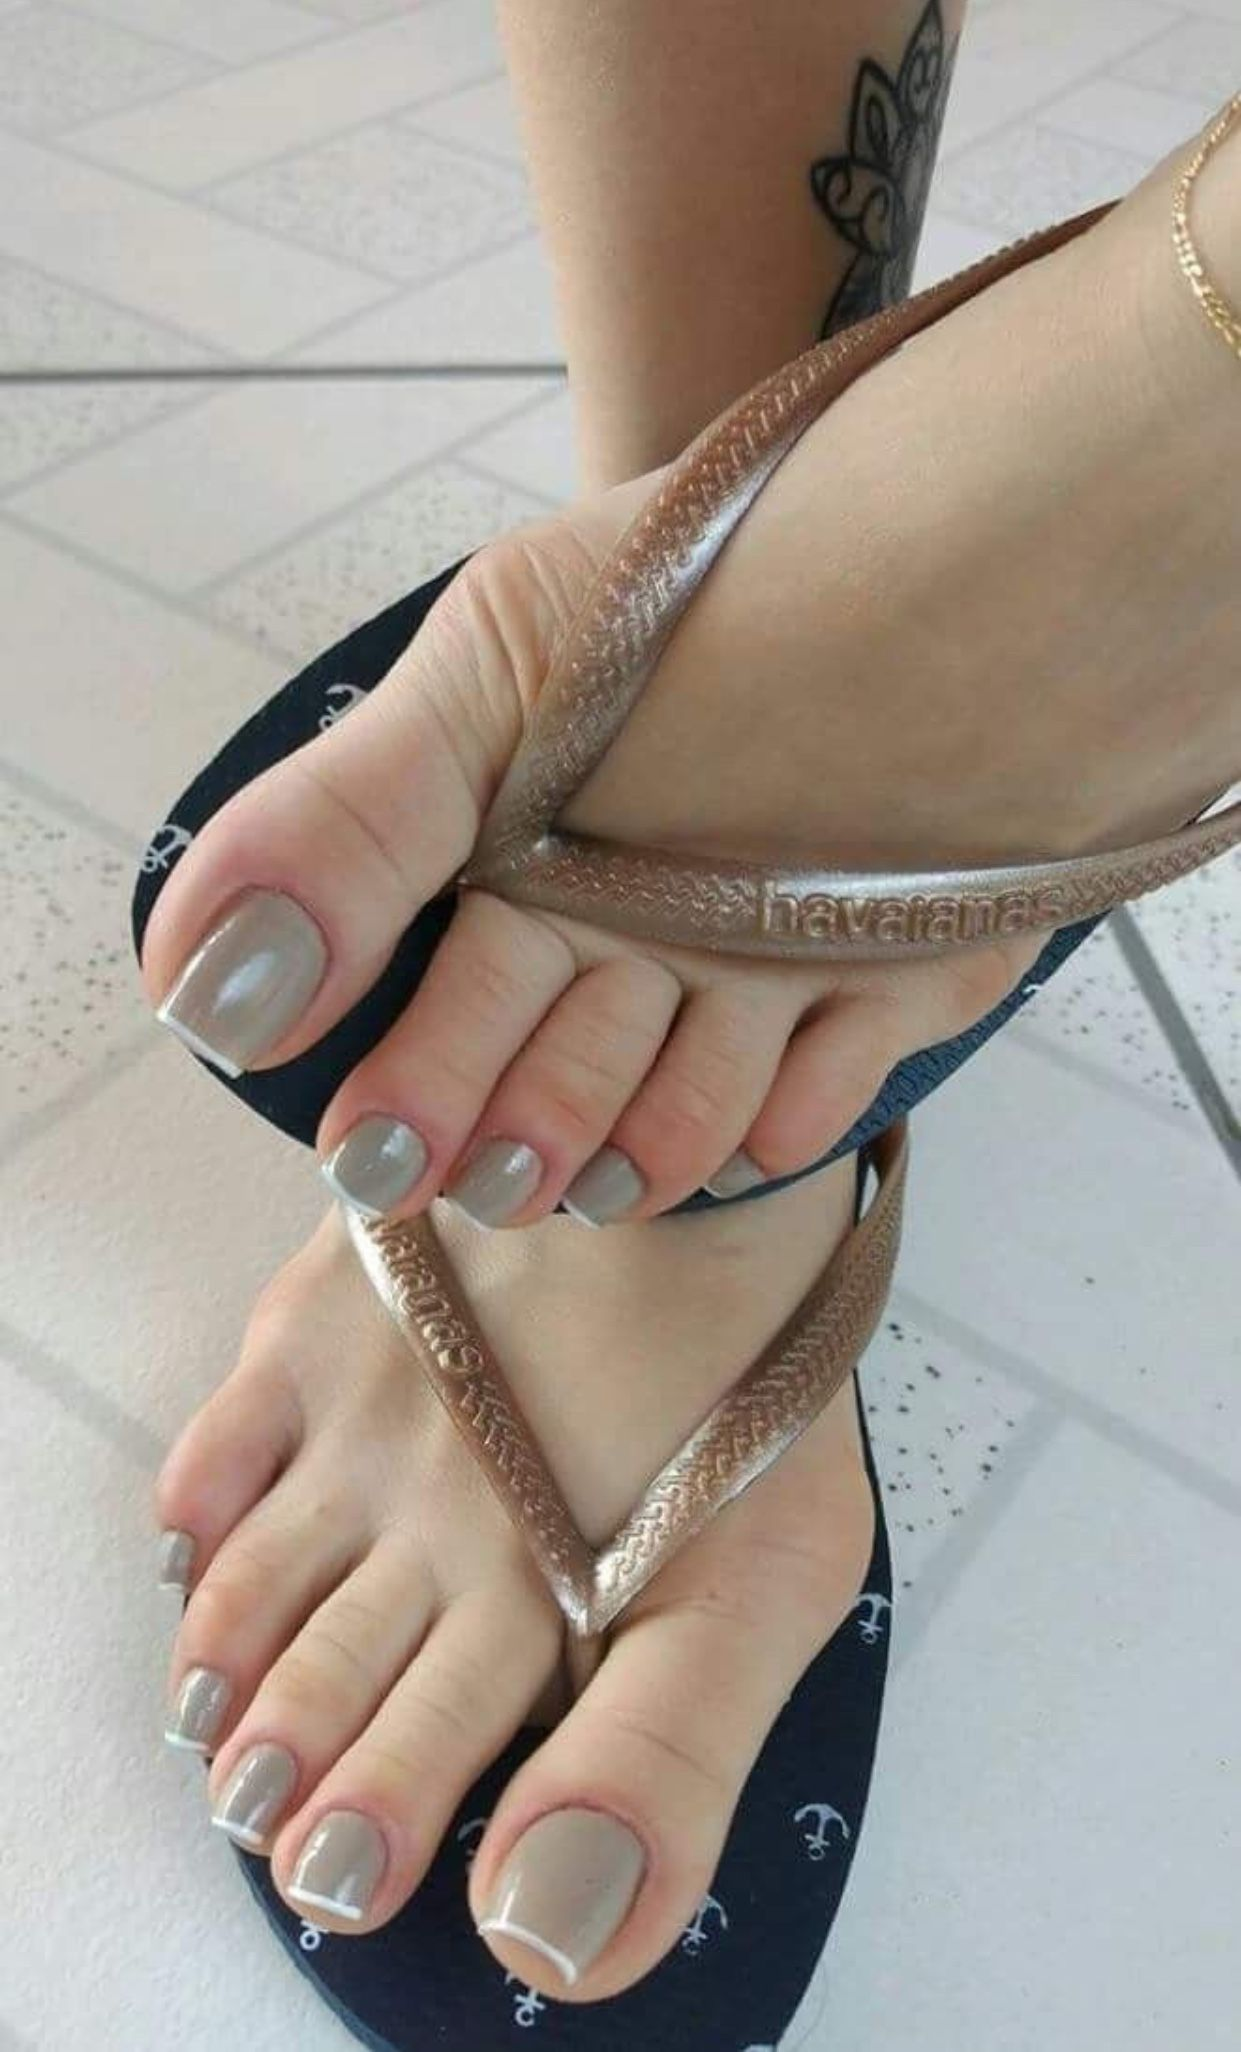 Pin on Pretty Feet